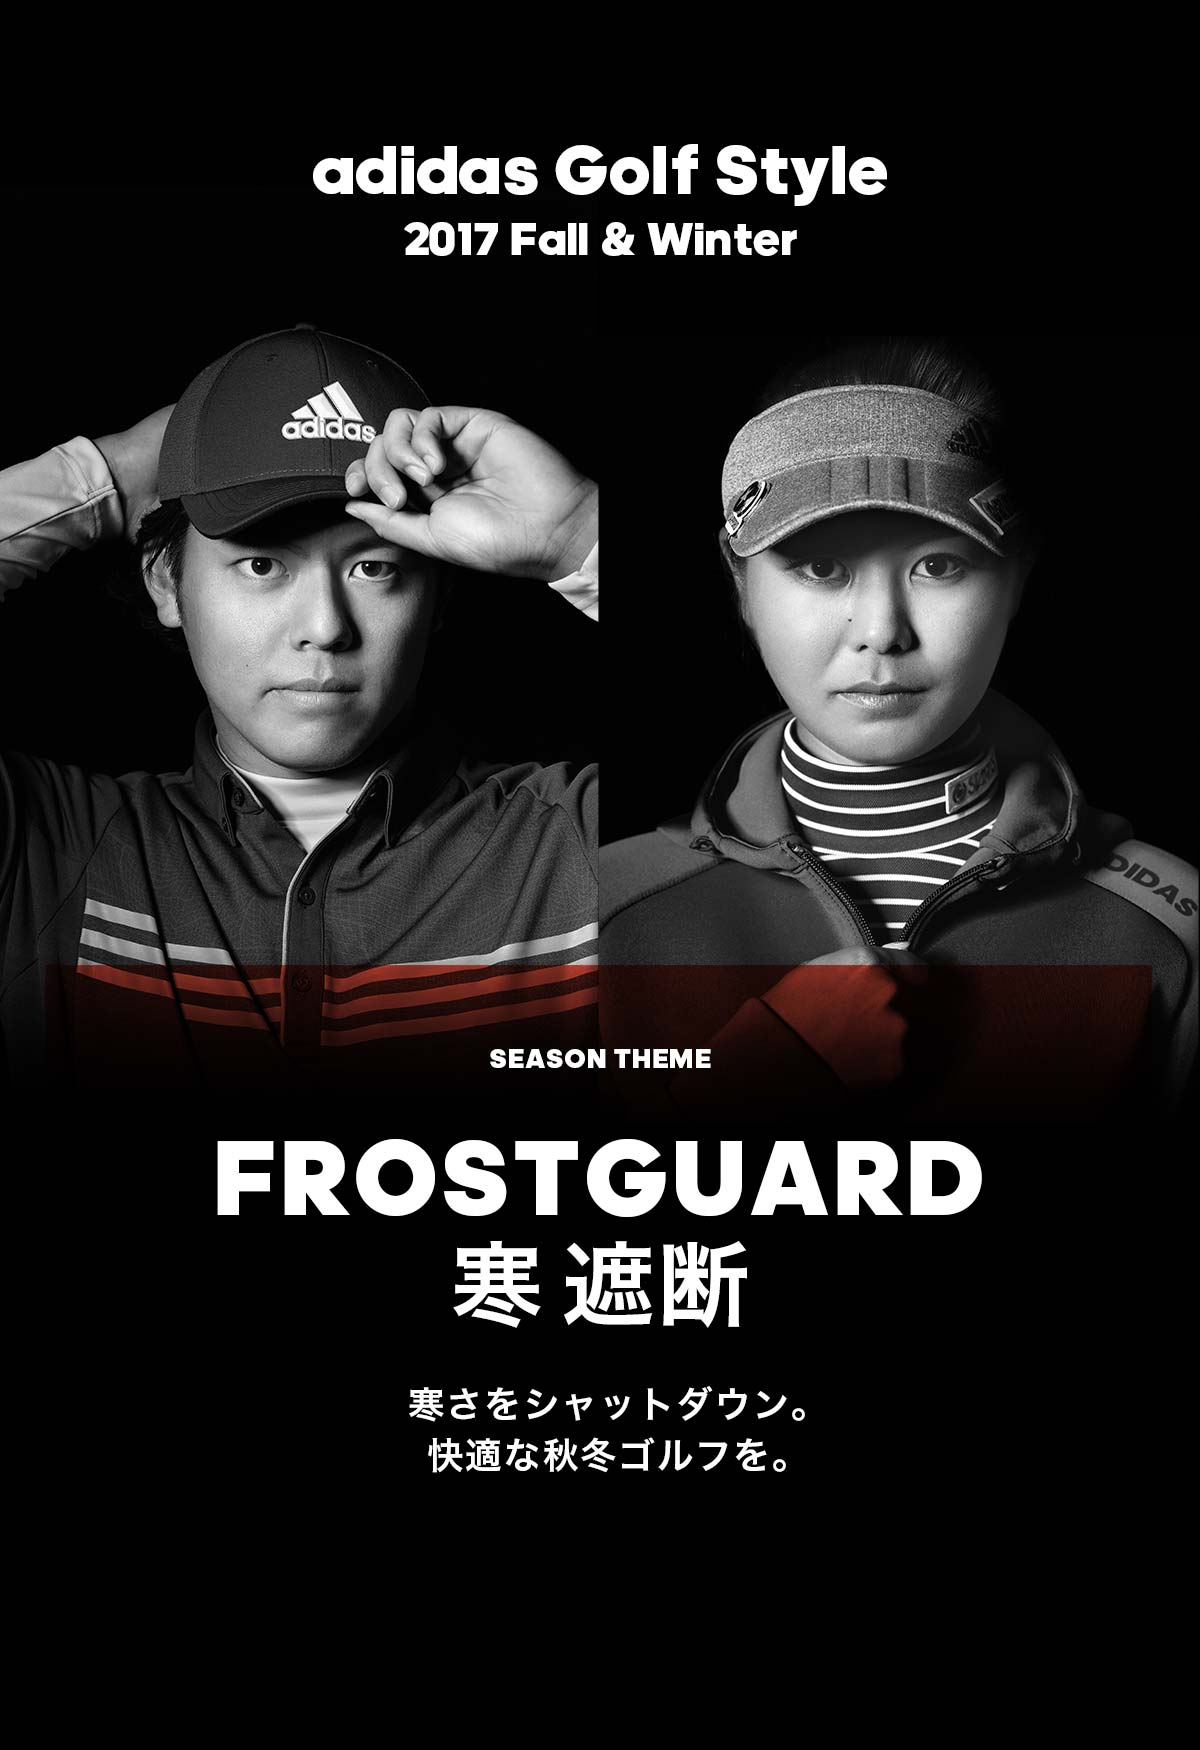 adidas Golf Style 2017 Fall & Winter  SEASON THEME FROSTGUARD 寒遮断 寒さをシャットダウン。快適な秋冬ゴルフを。